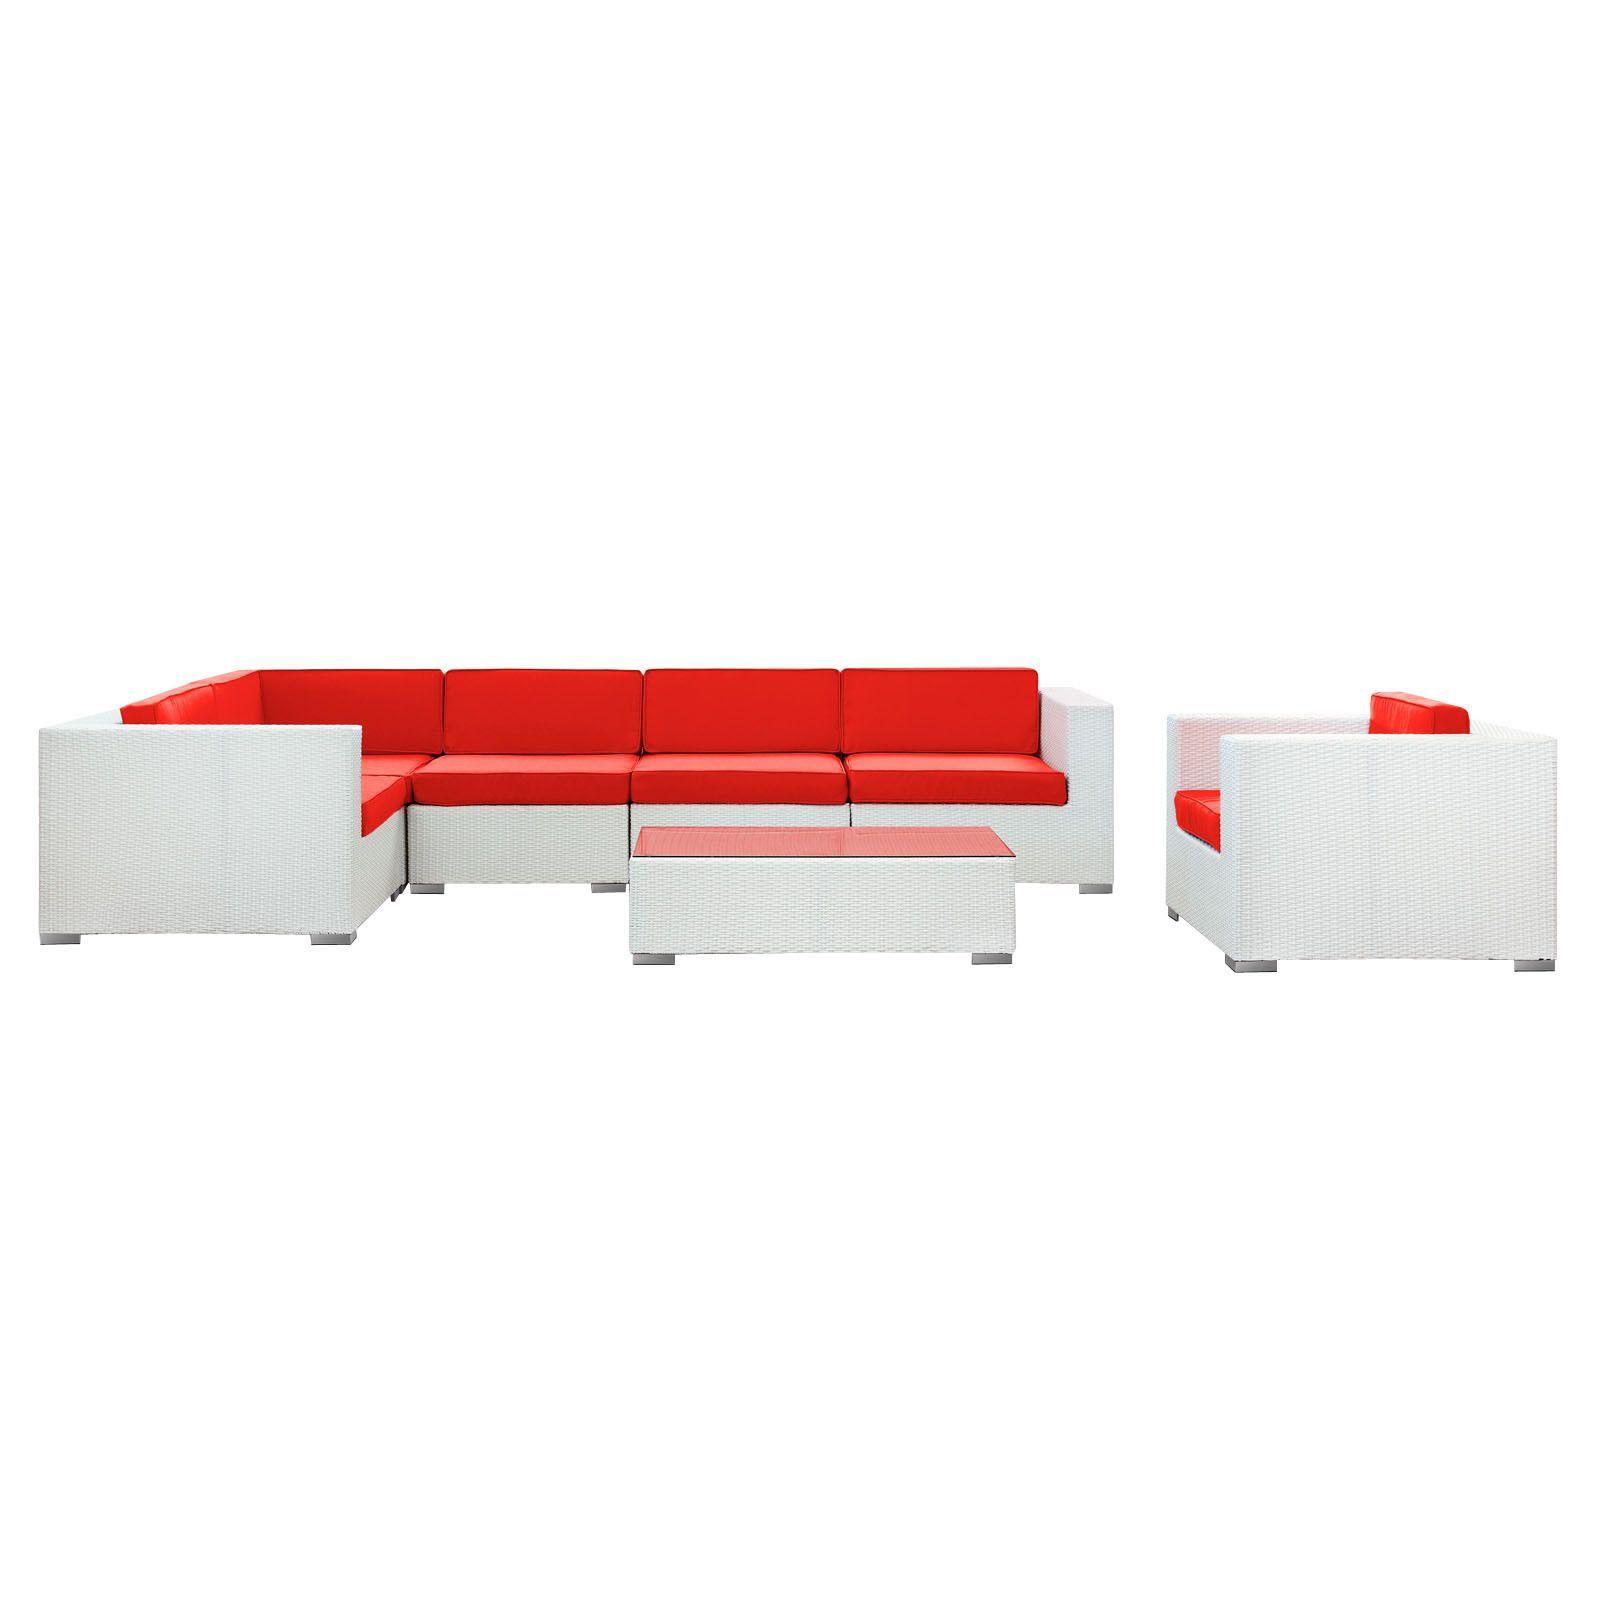 Modway Furniture Corona 7 Piece Outdoor Patio Sectional Set